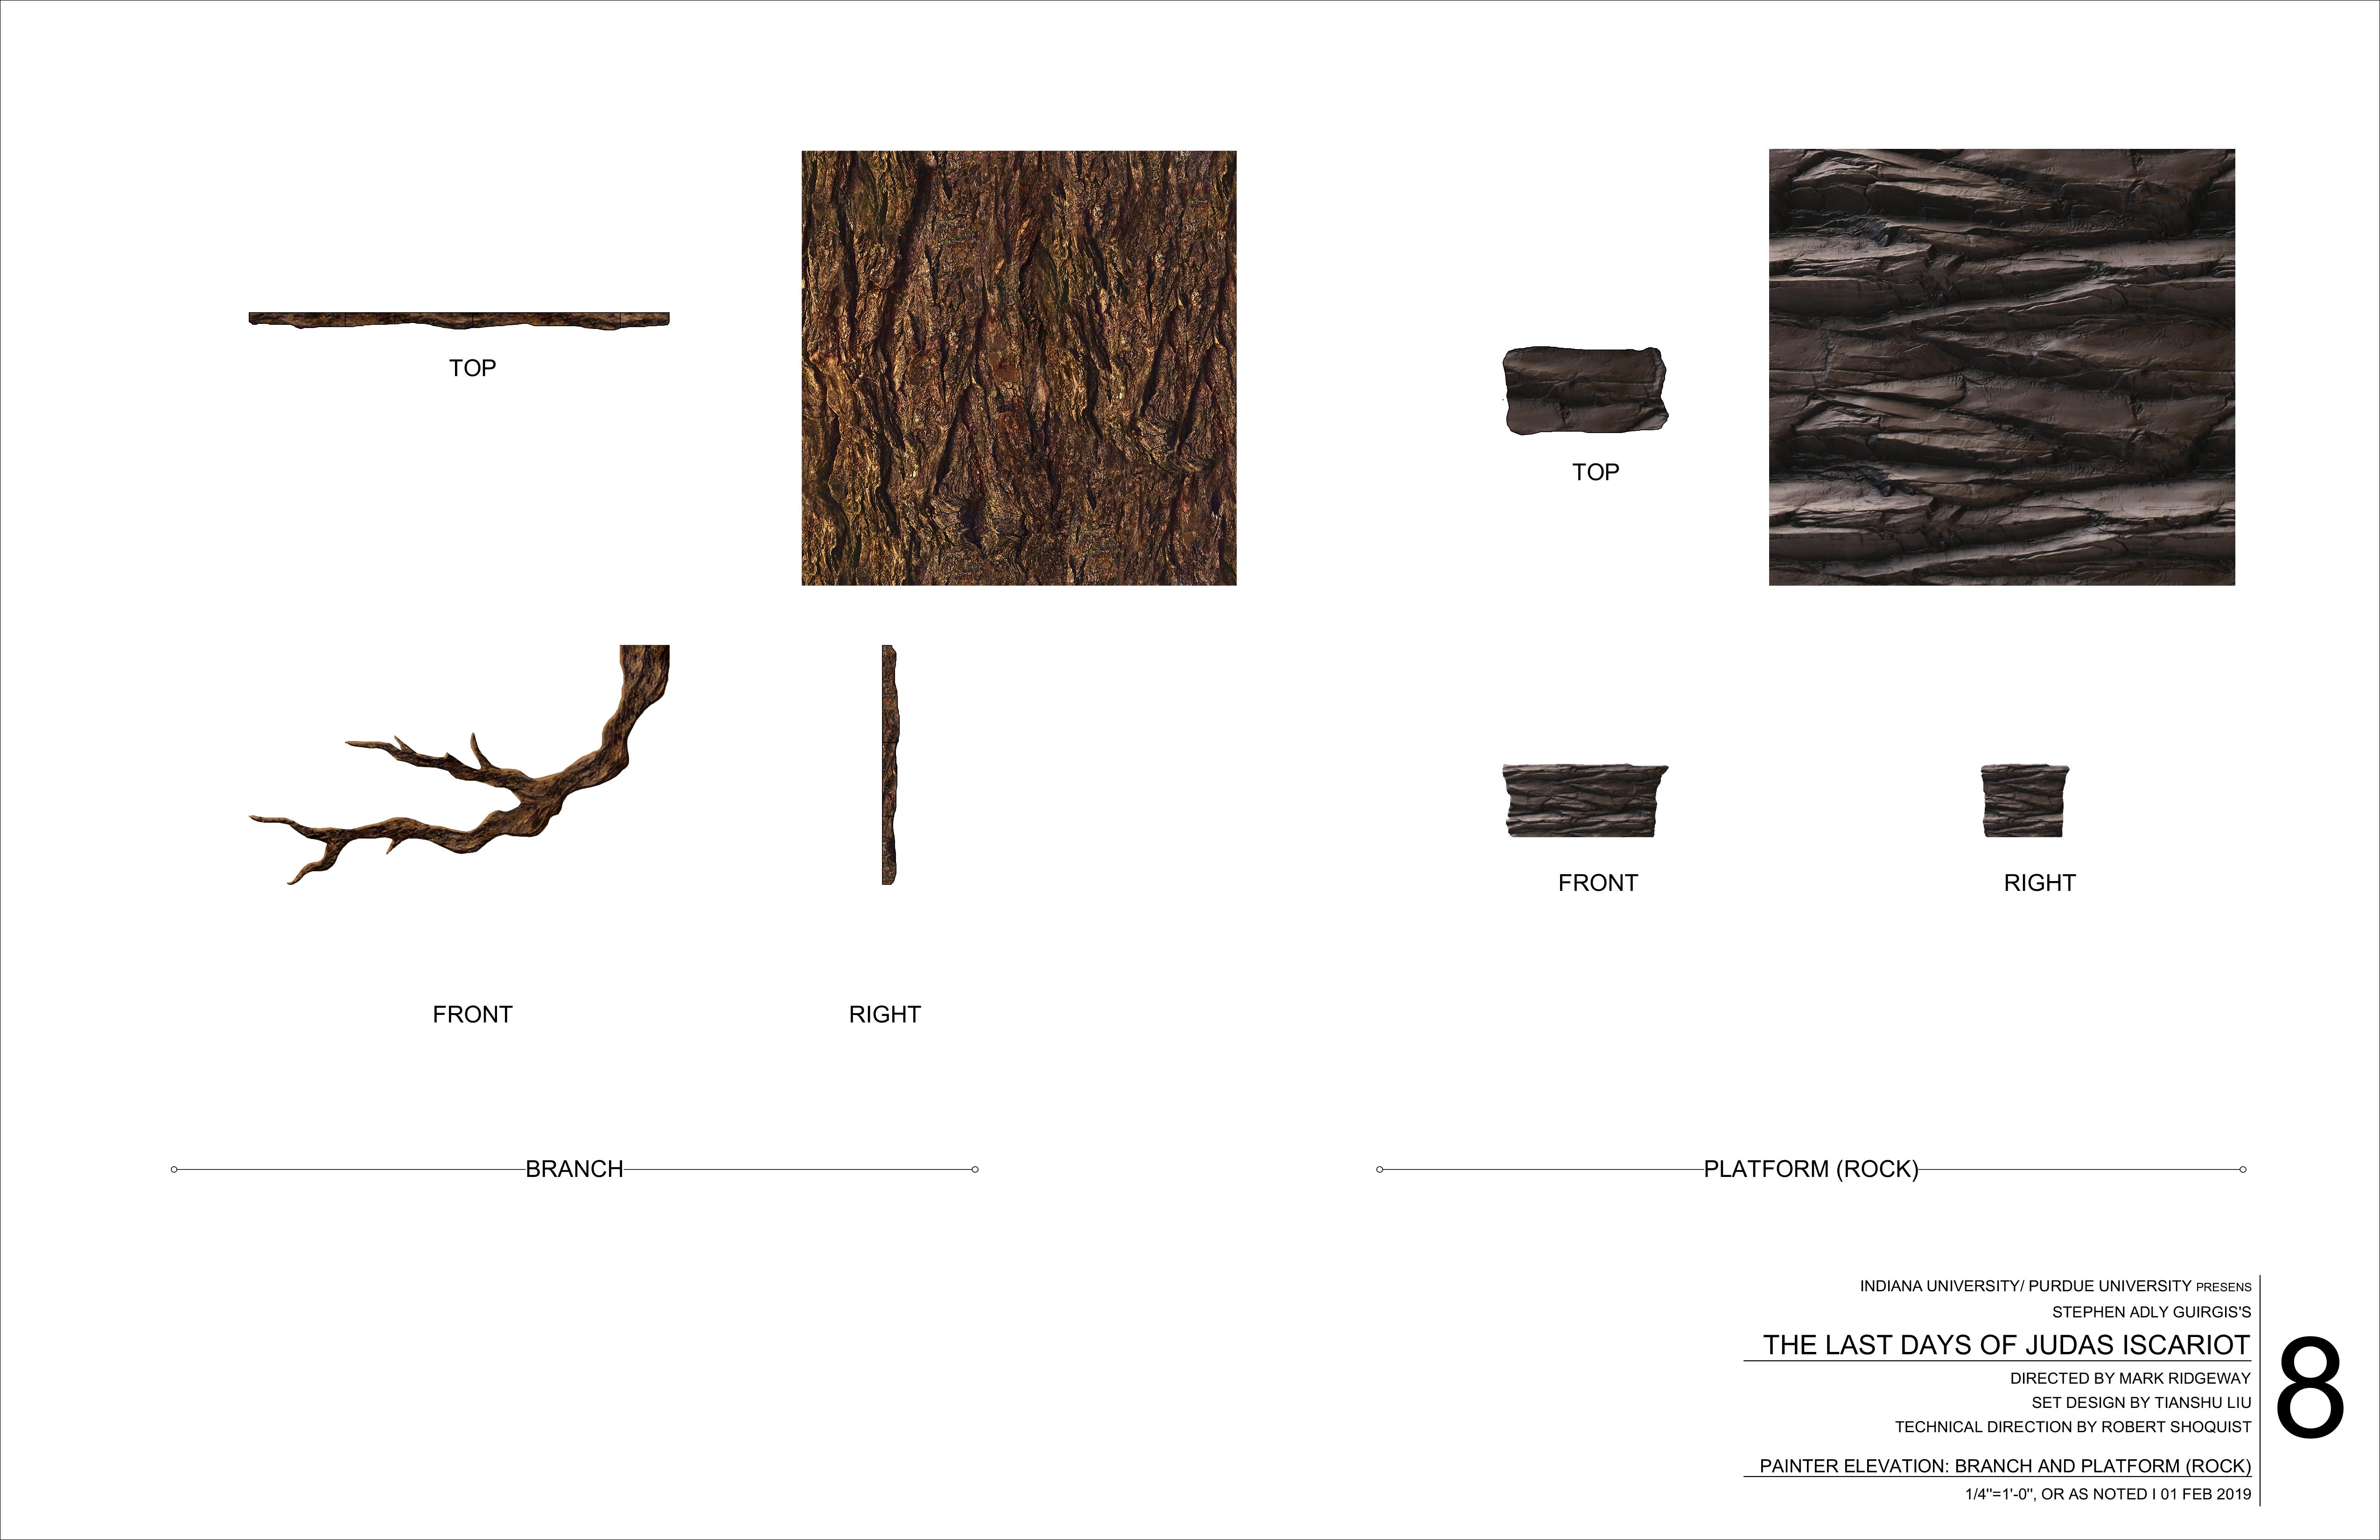 Branch and Rock Platform